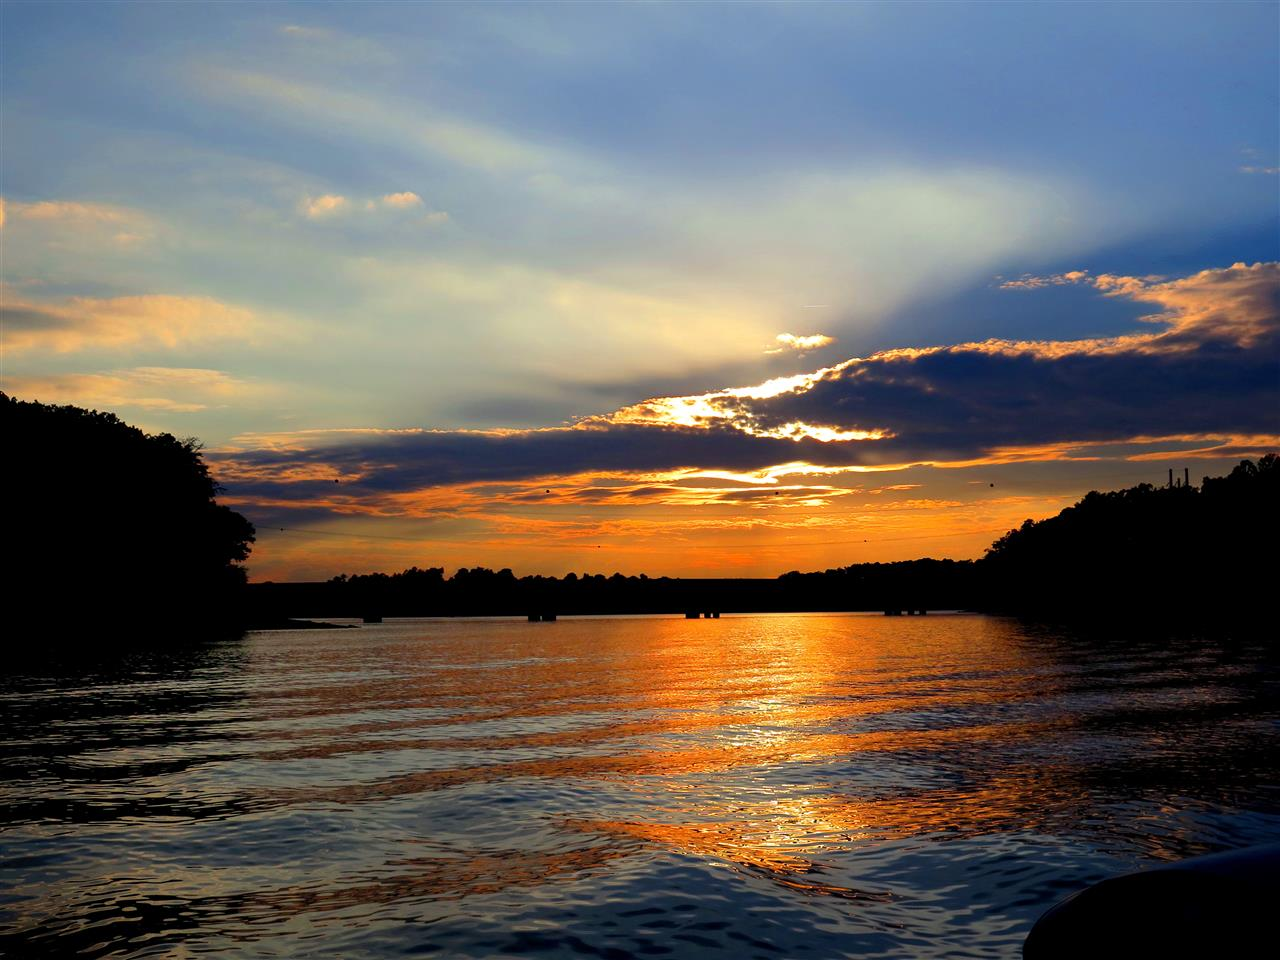 Lake Lanier Sunset, Gainesville, GA